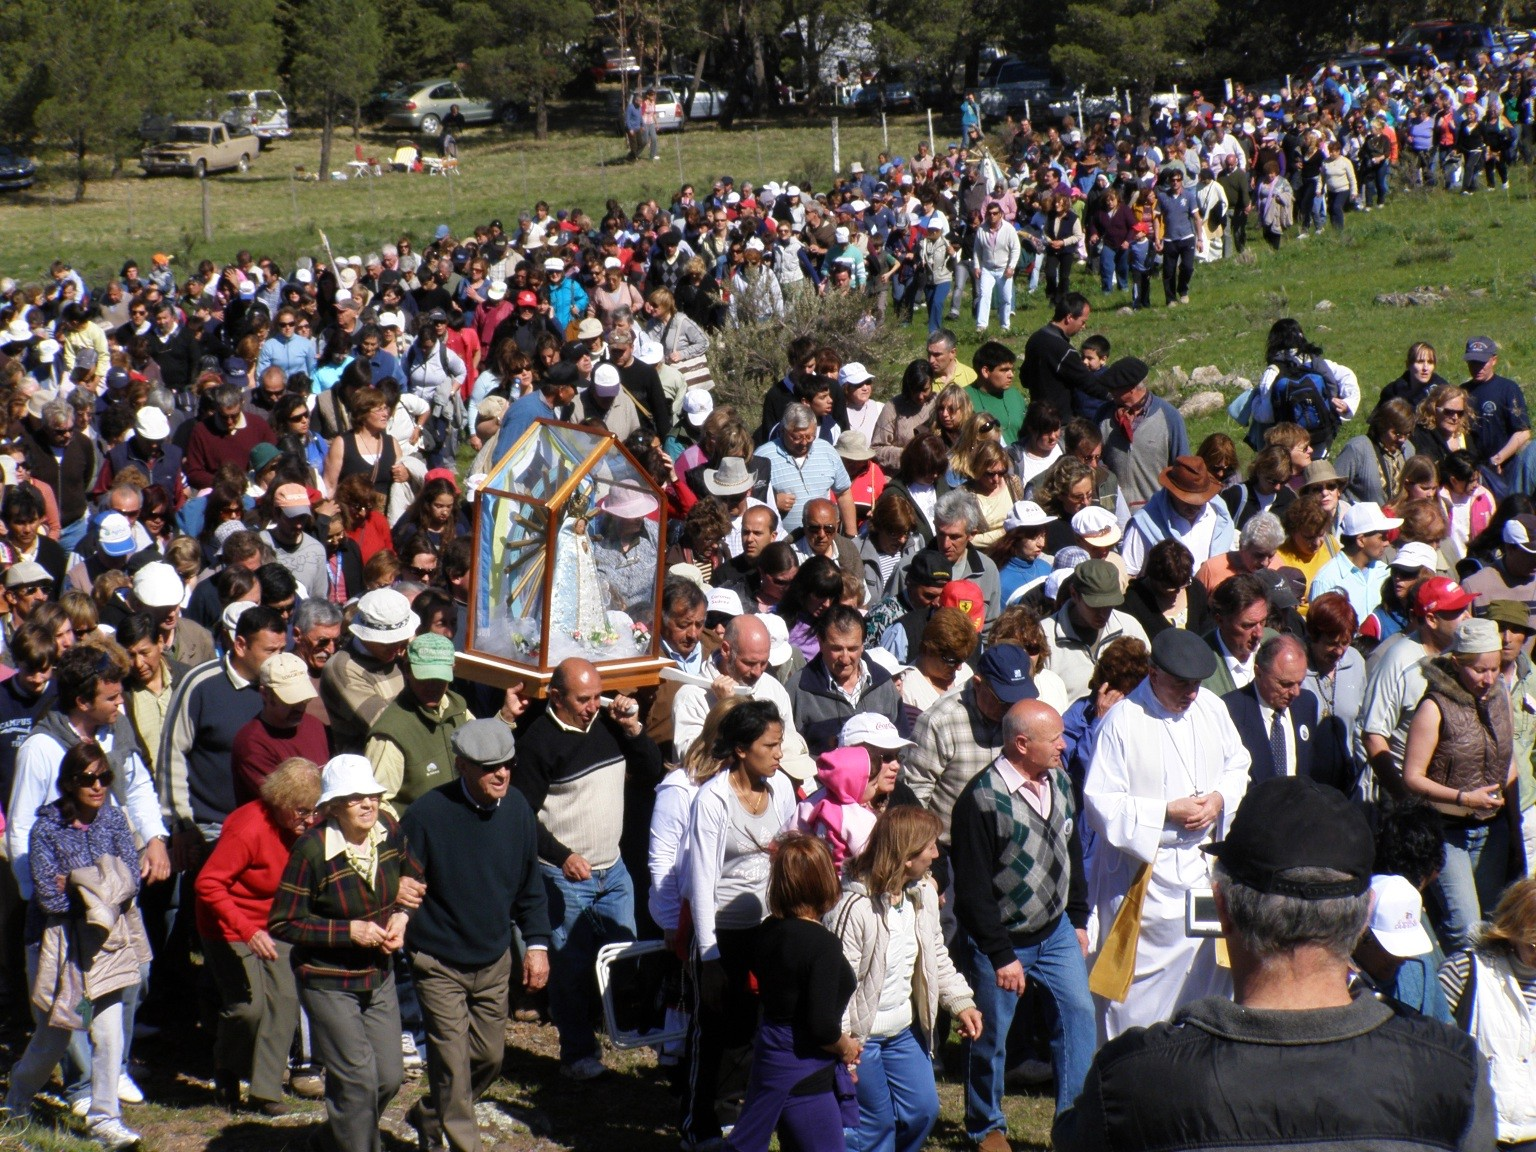 Saavedra – Llega una fecha esperada, la peregrinación anual a la Ermita